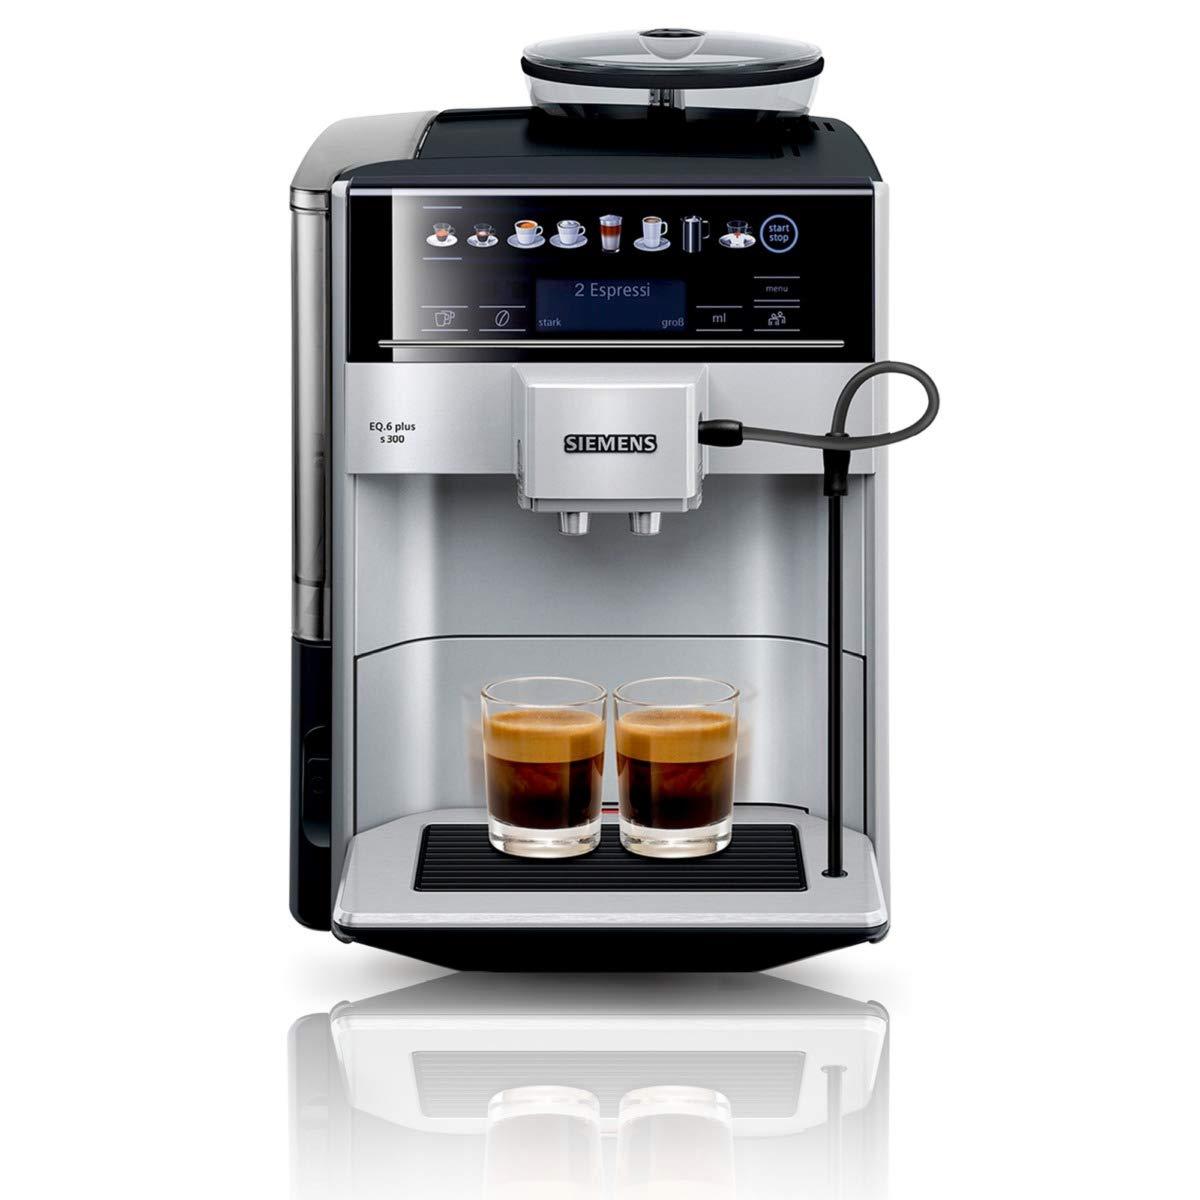 Siemens te653501de per caffè espresso automatica EQ.6Plus S300, 1500W, Argento 1500W